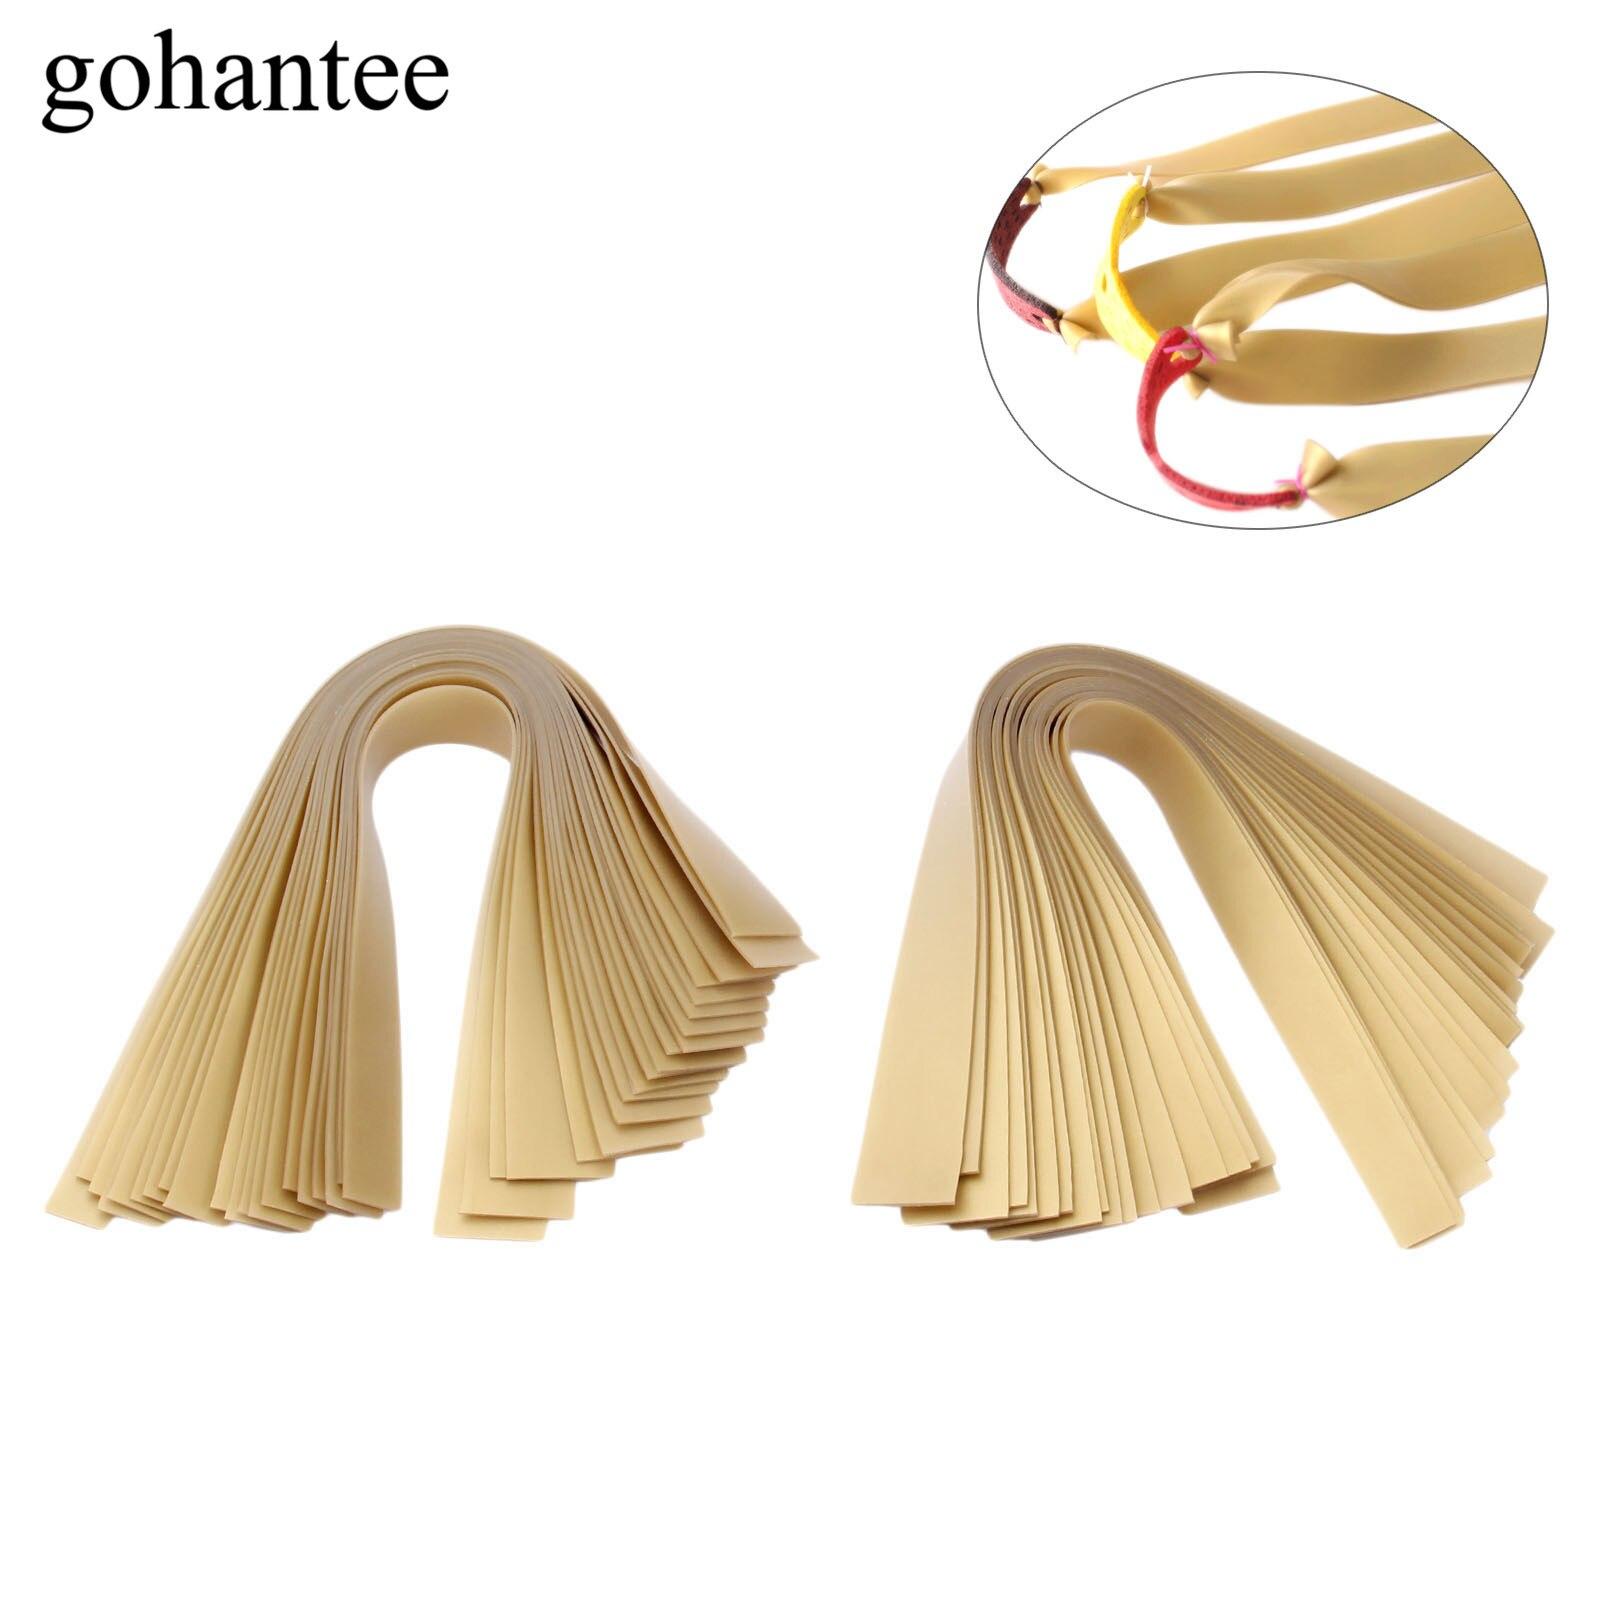 20Pcs 0.7mm/0.8mm Thickness*25cm Length Slingshots Rubber Band Tube Golden Natural Latex Flat Rubber Band For Slingshot Catapult